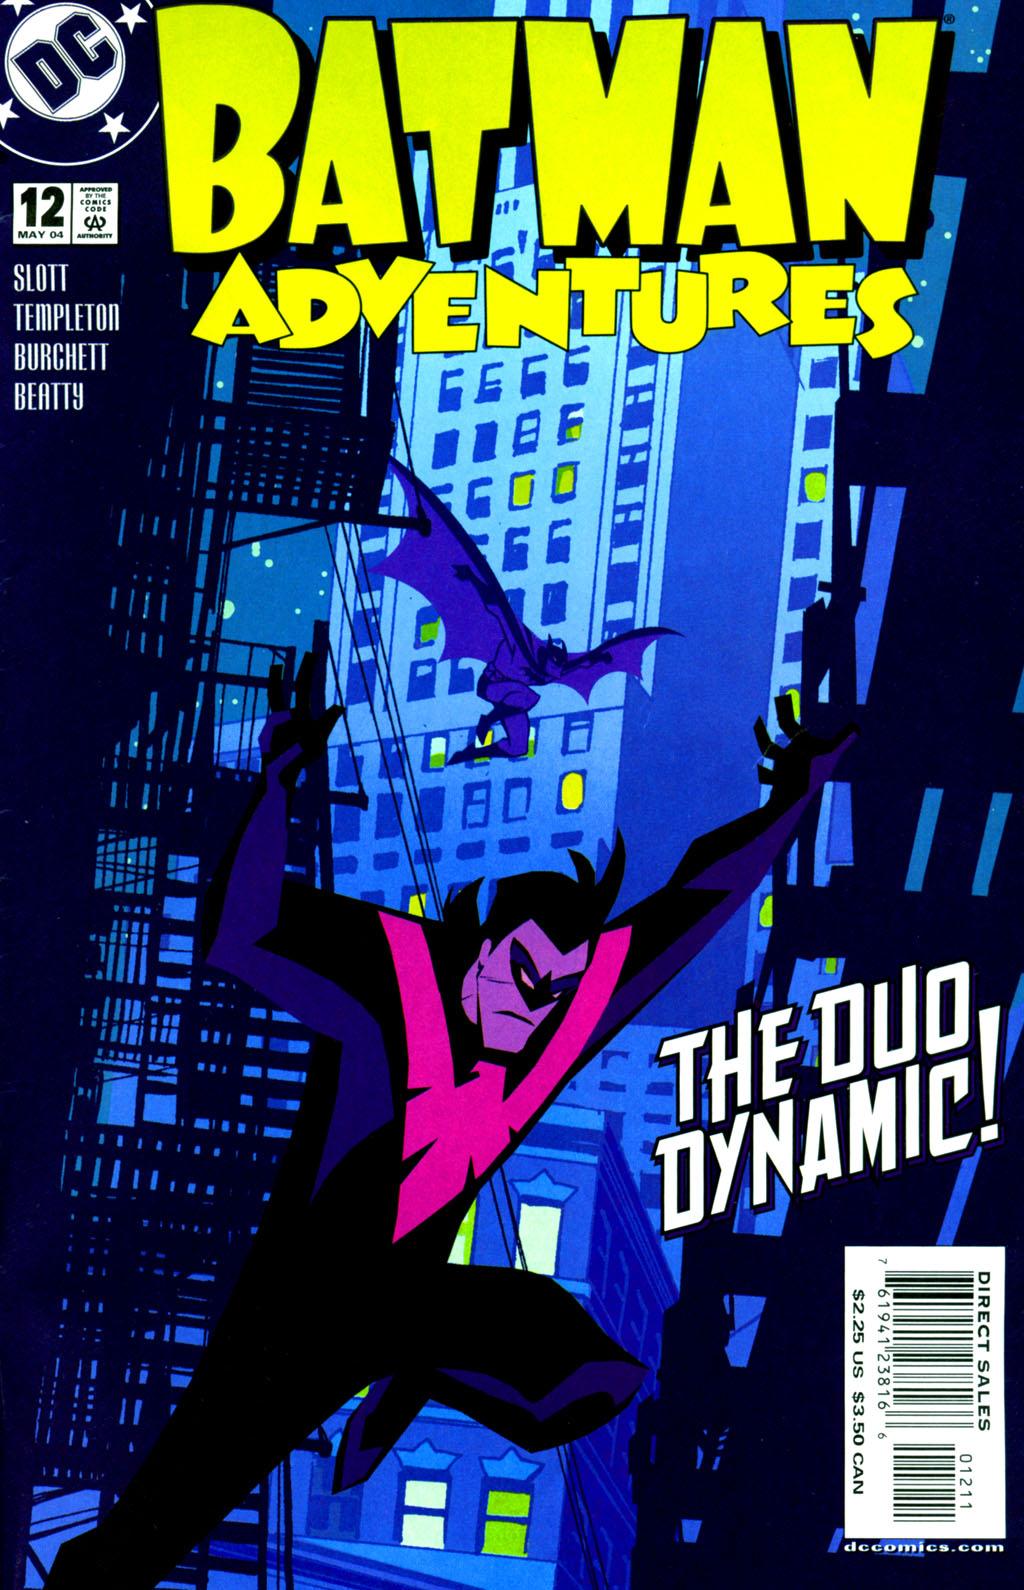 batman adventures 2003 issue 12 viewcomic reading comics. Black Bedroom Furniture Sets. Home Design Ideas